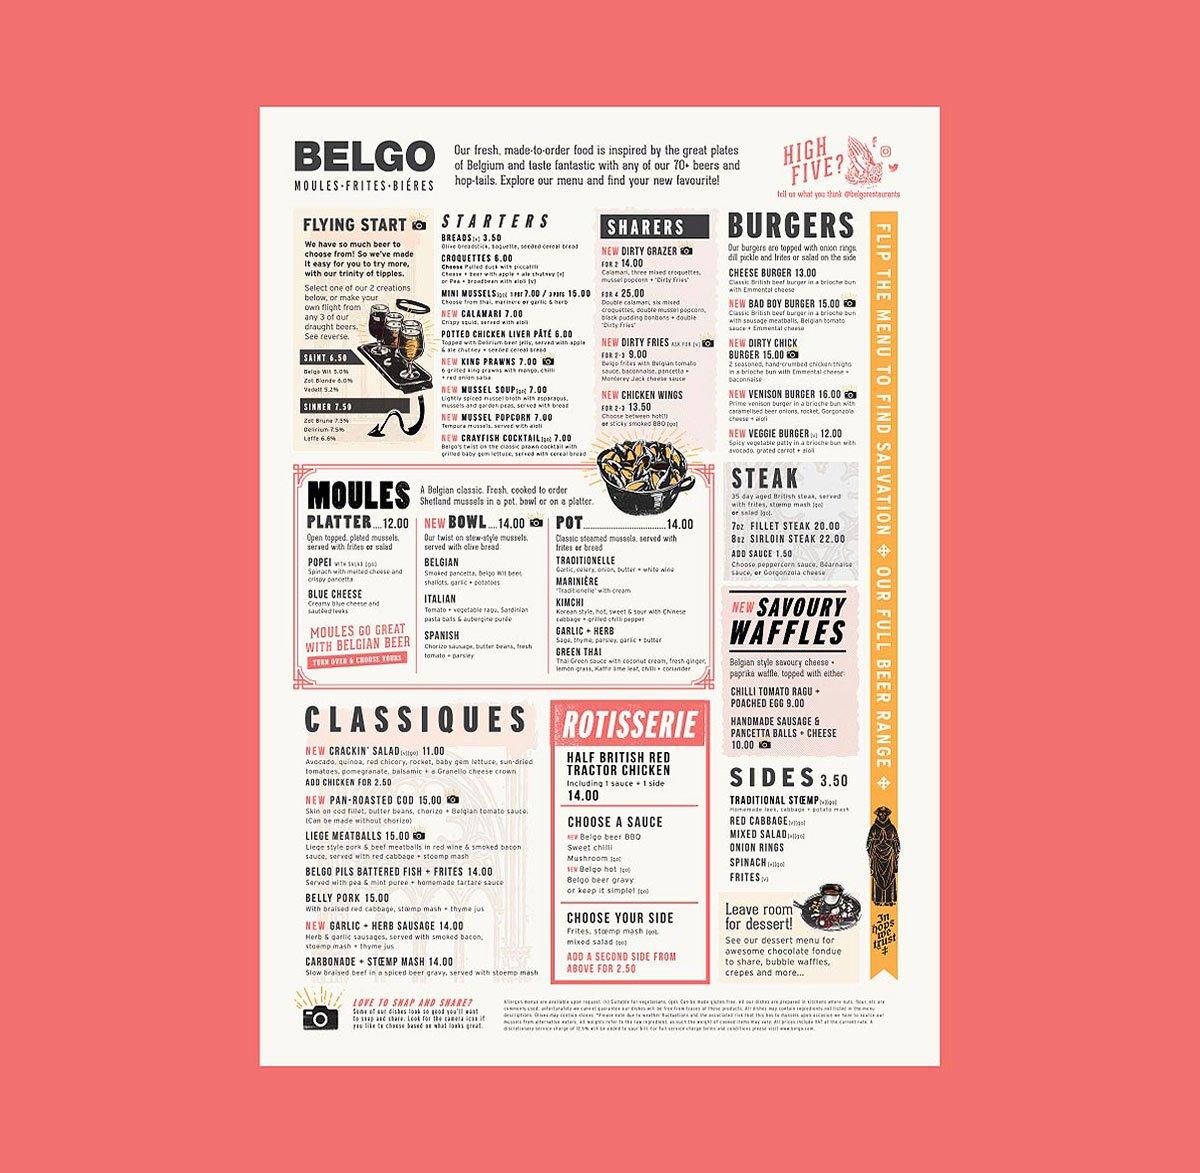 Belgo-repositioning-A3-menu-Design